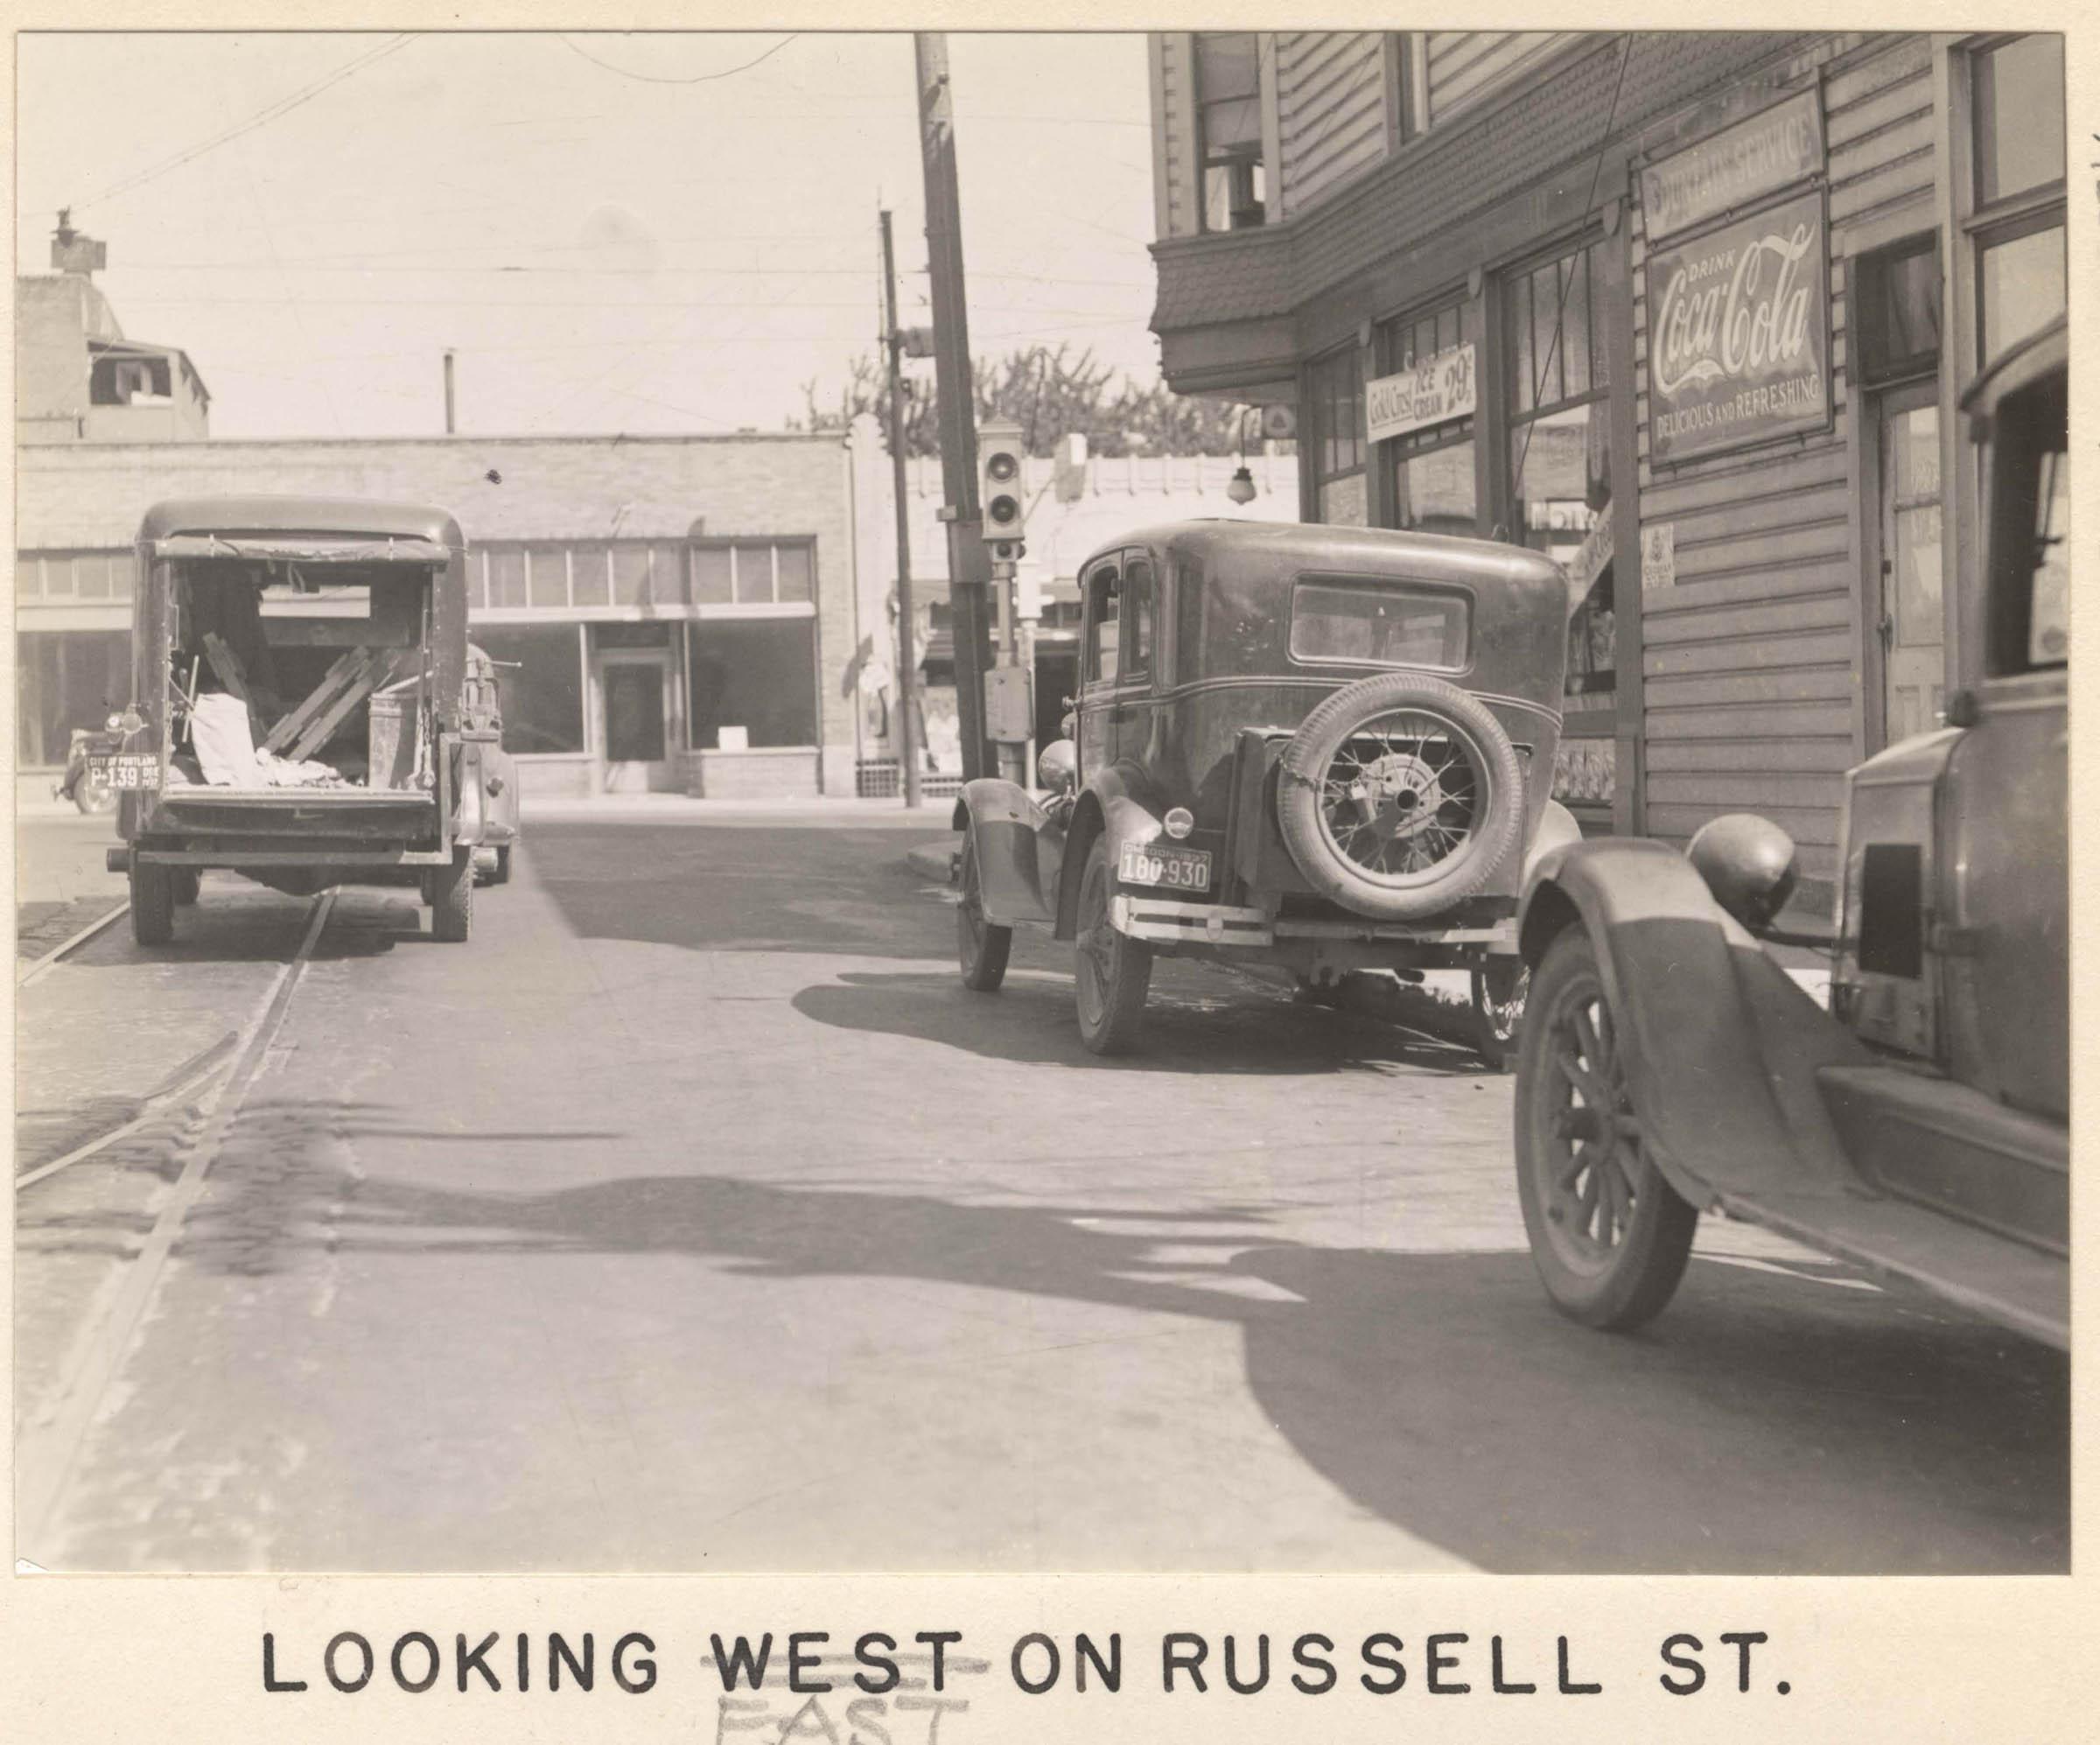 Russell Street Jam with Mars retrieval Unit